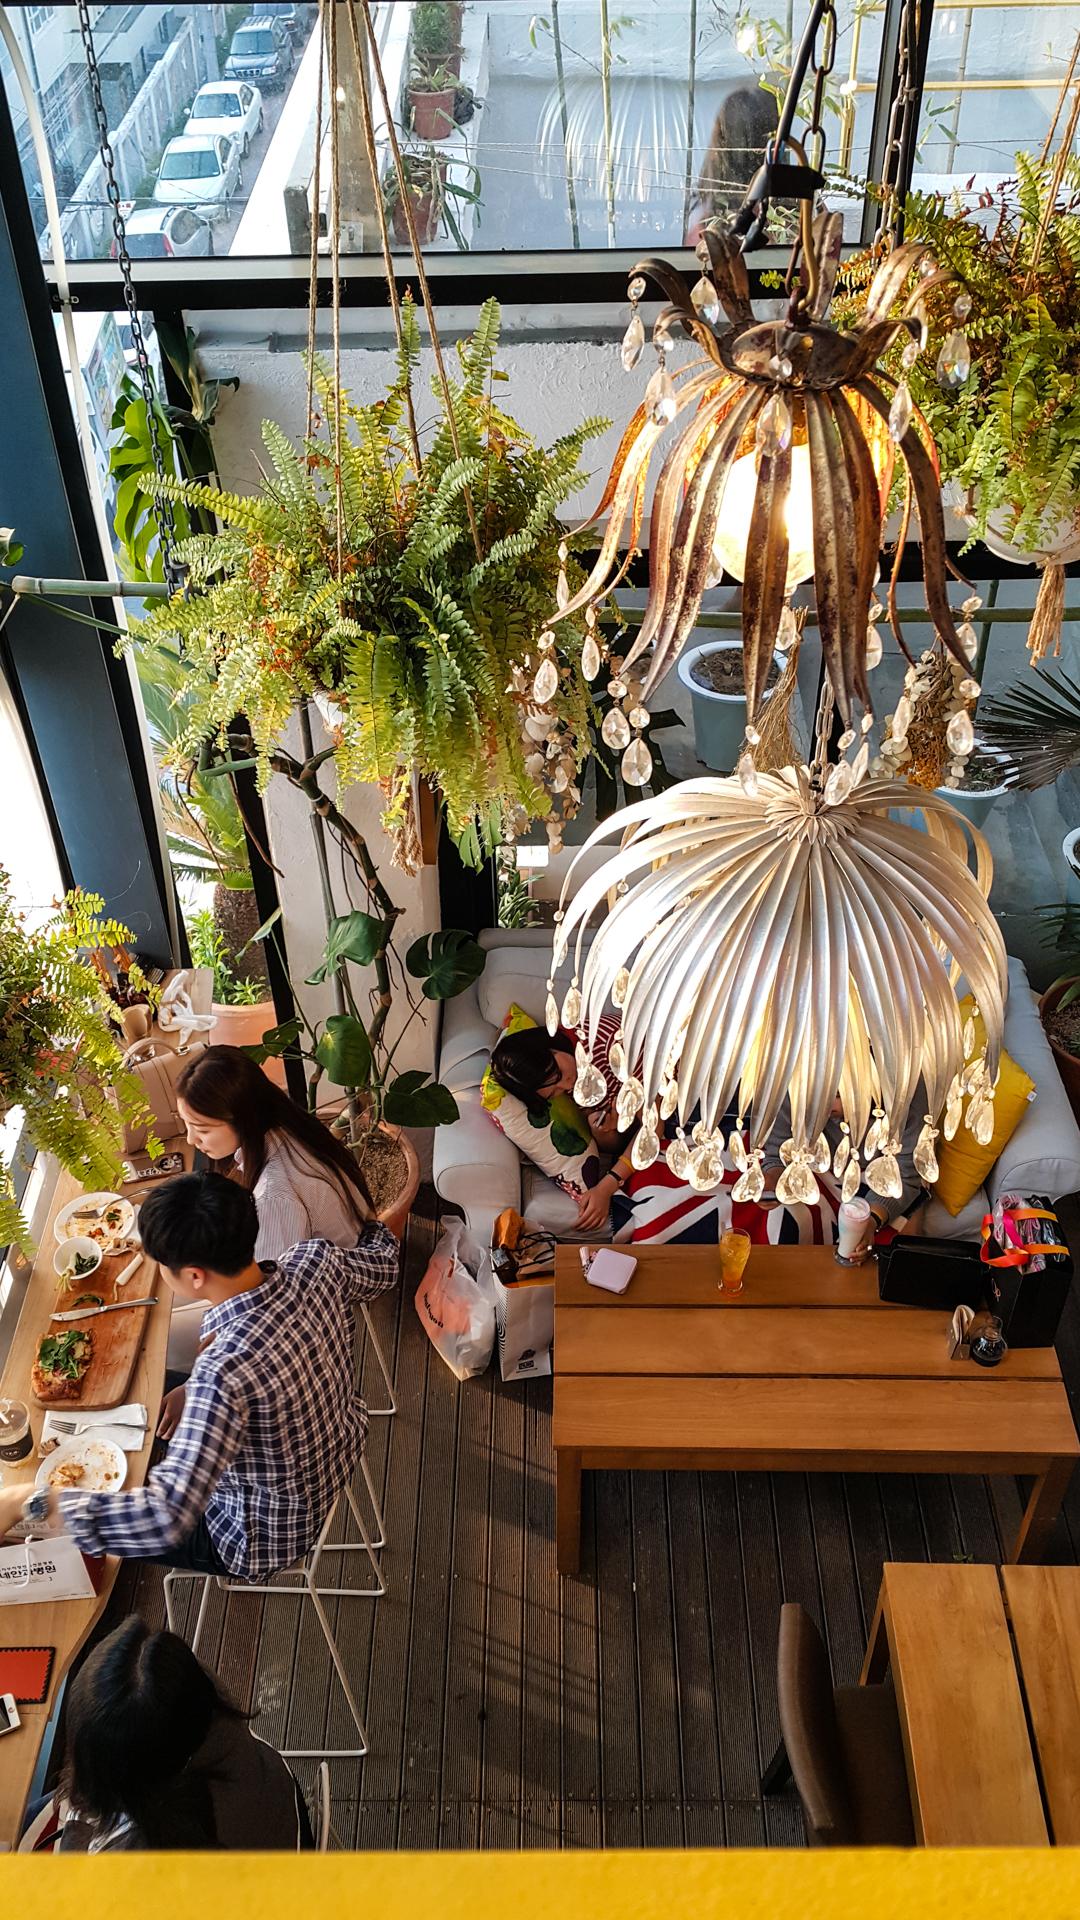 daegu eats // 7pm gastro pub & cafe